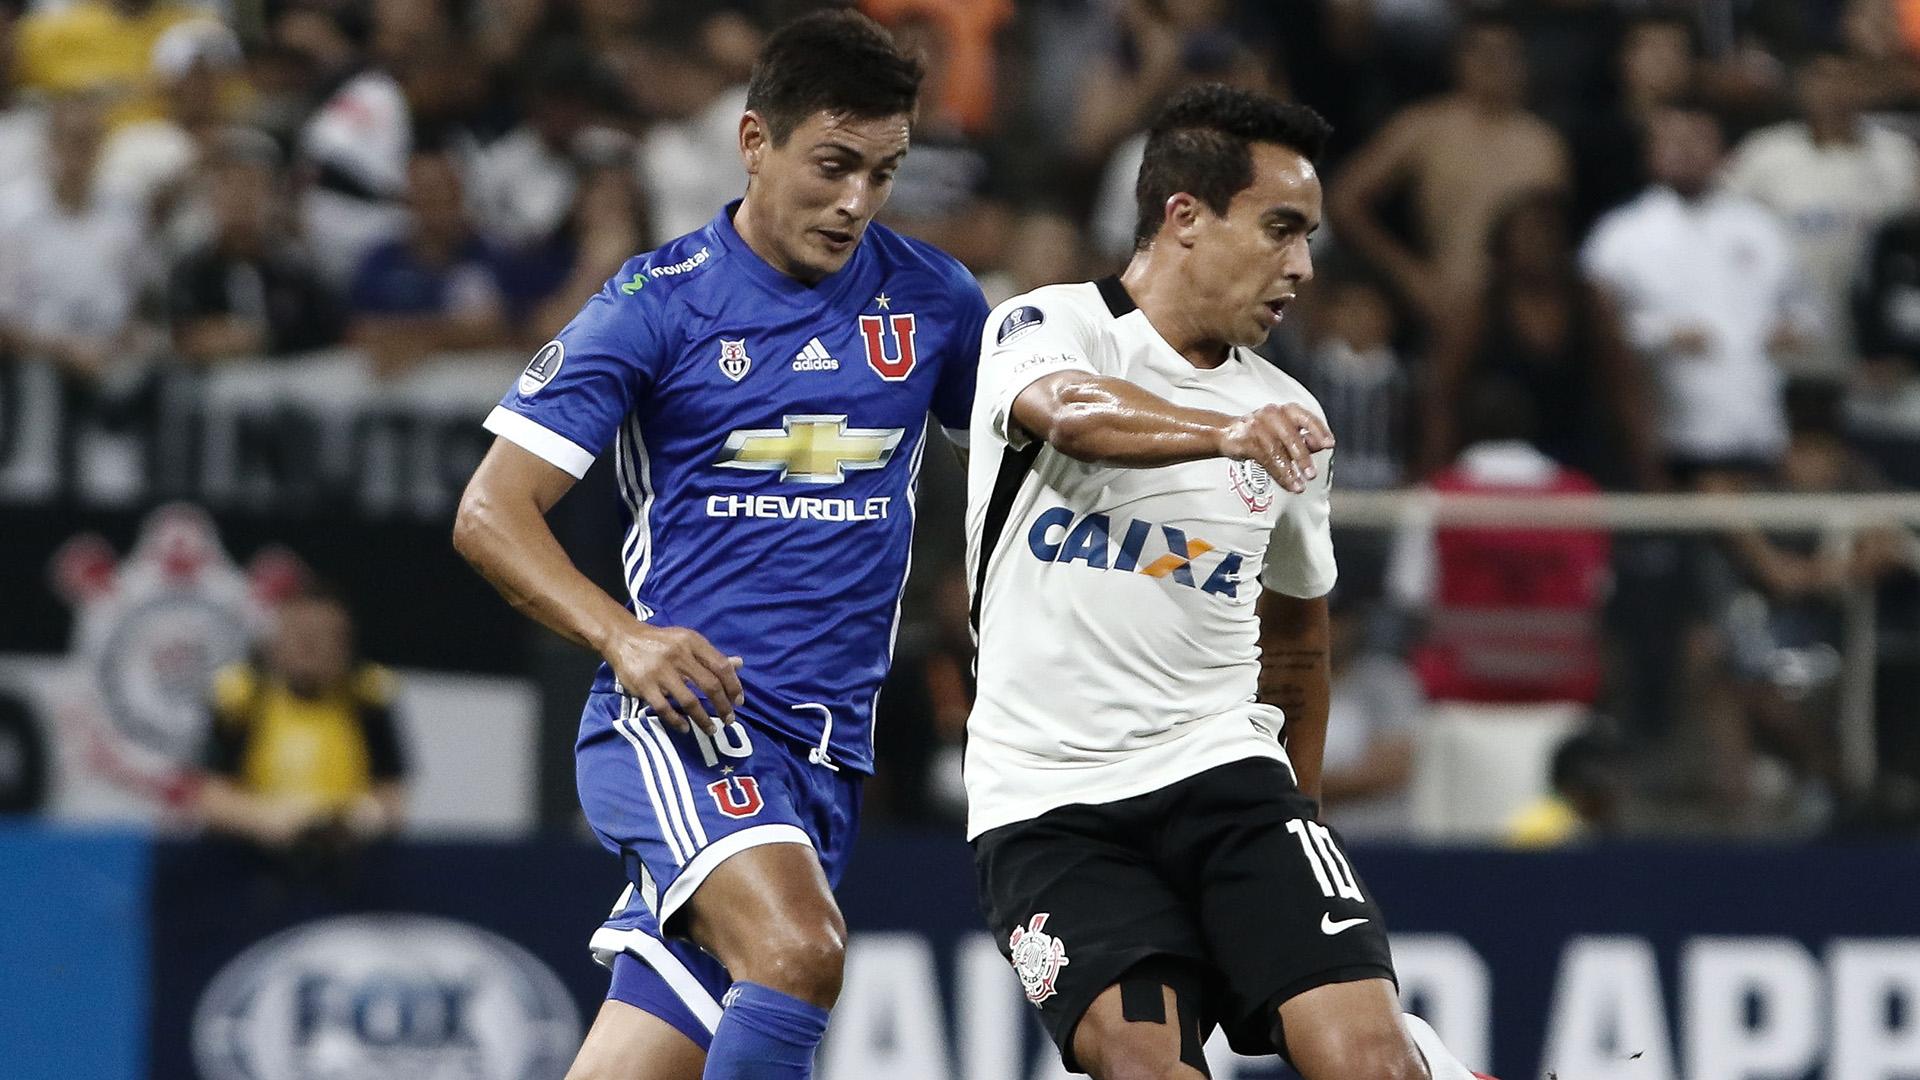 Jadson Matias Rodriguez Corinthians Universidad de Chile Copa Sudamericana 05042017